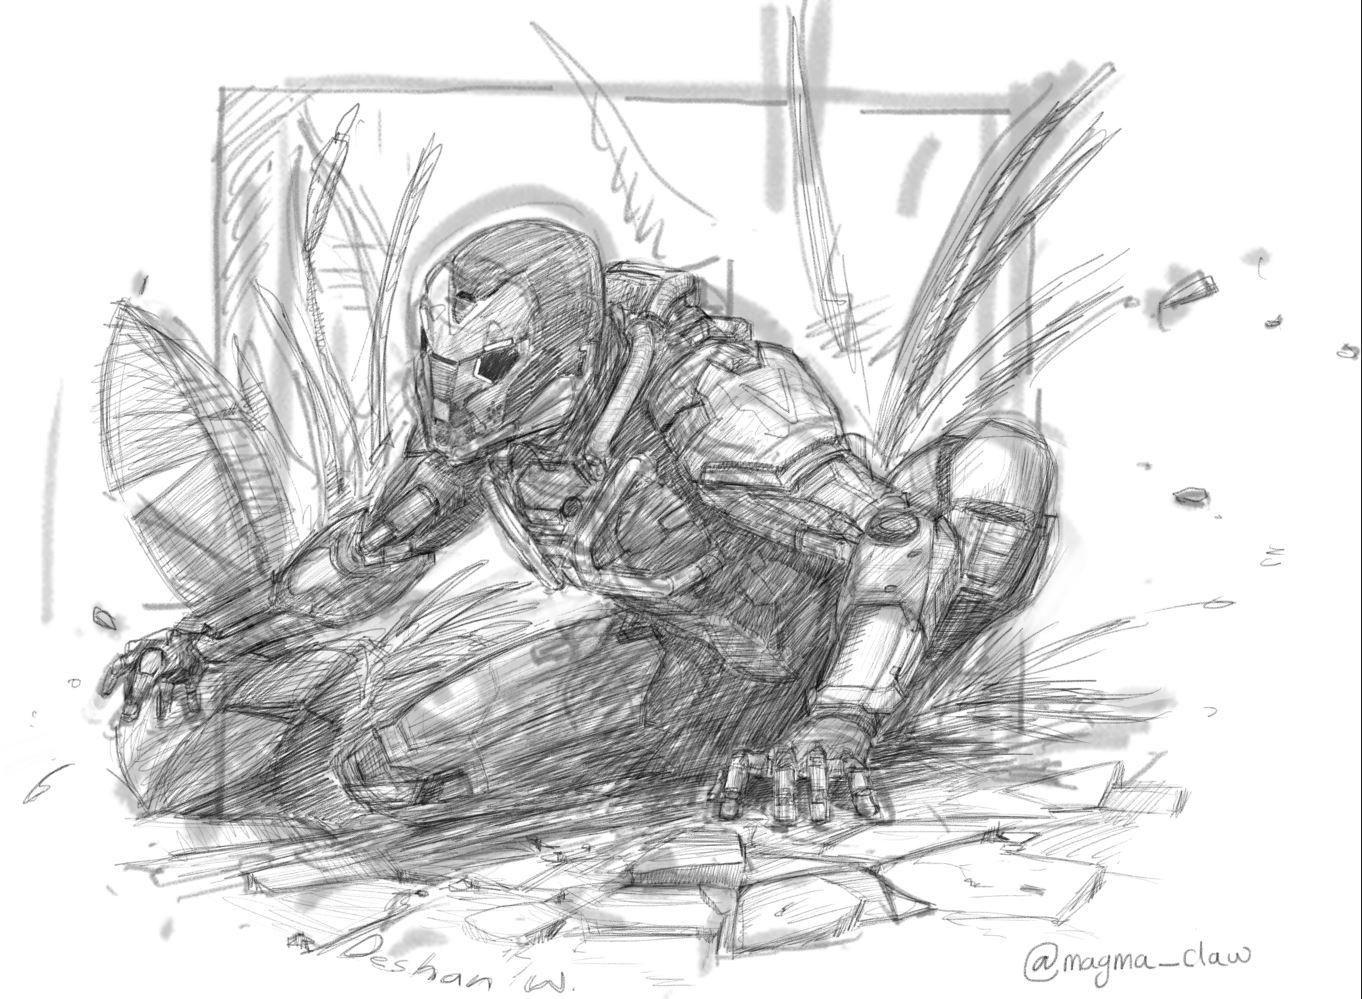 Anthem The Game Javelin Ranger Sketch Ifttt 2zoOmI6